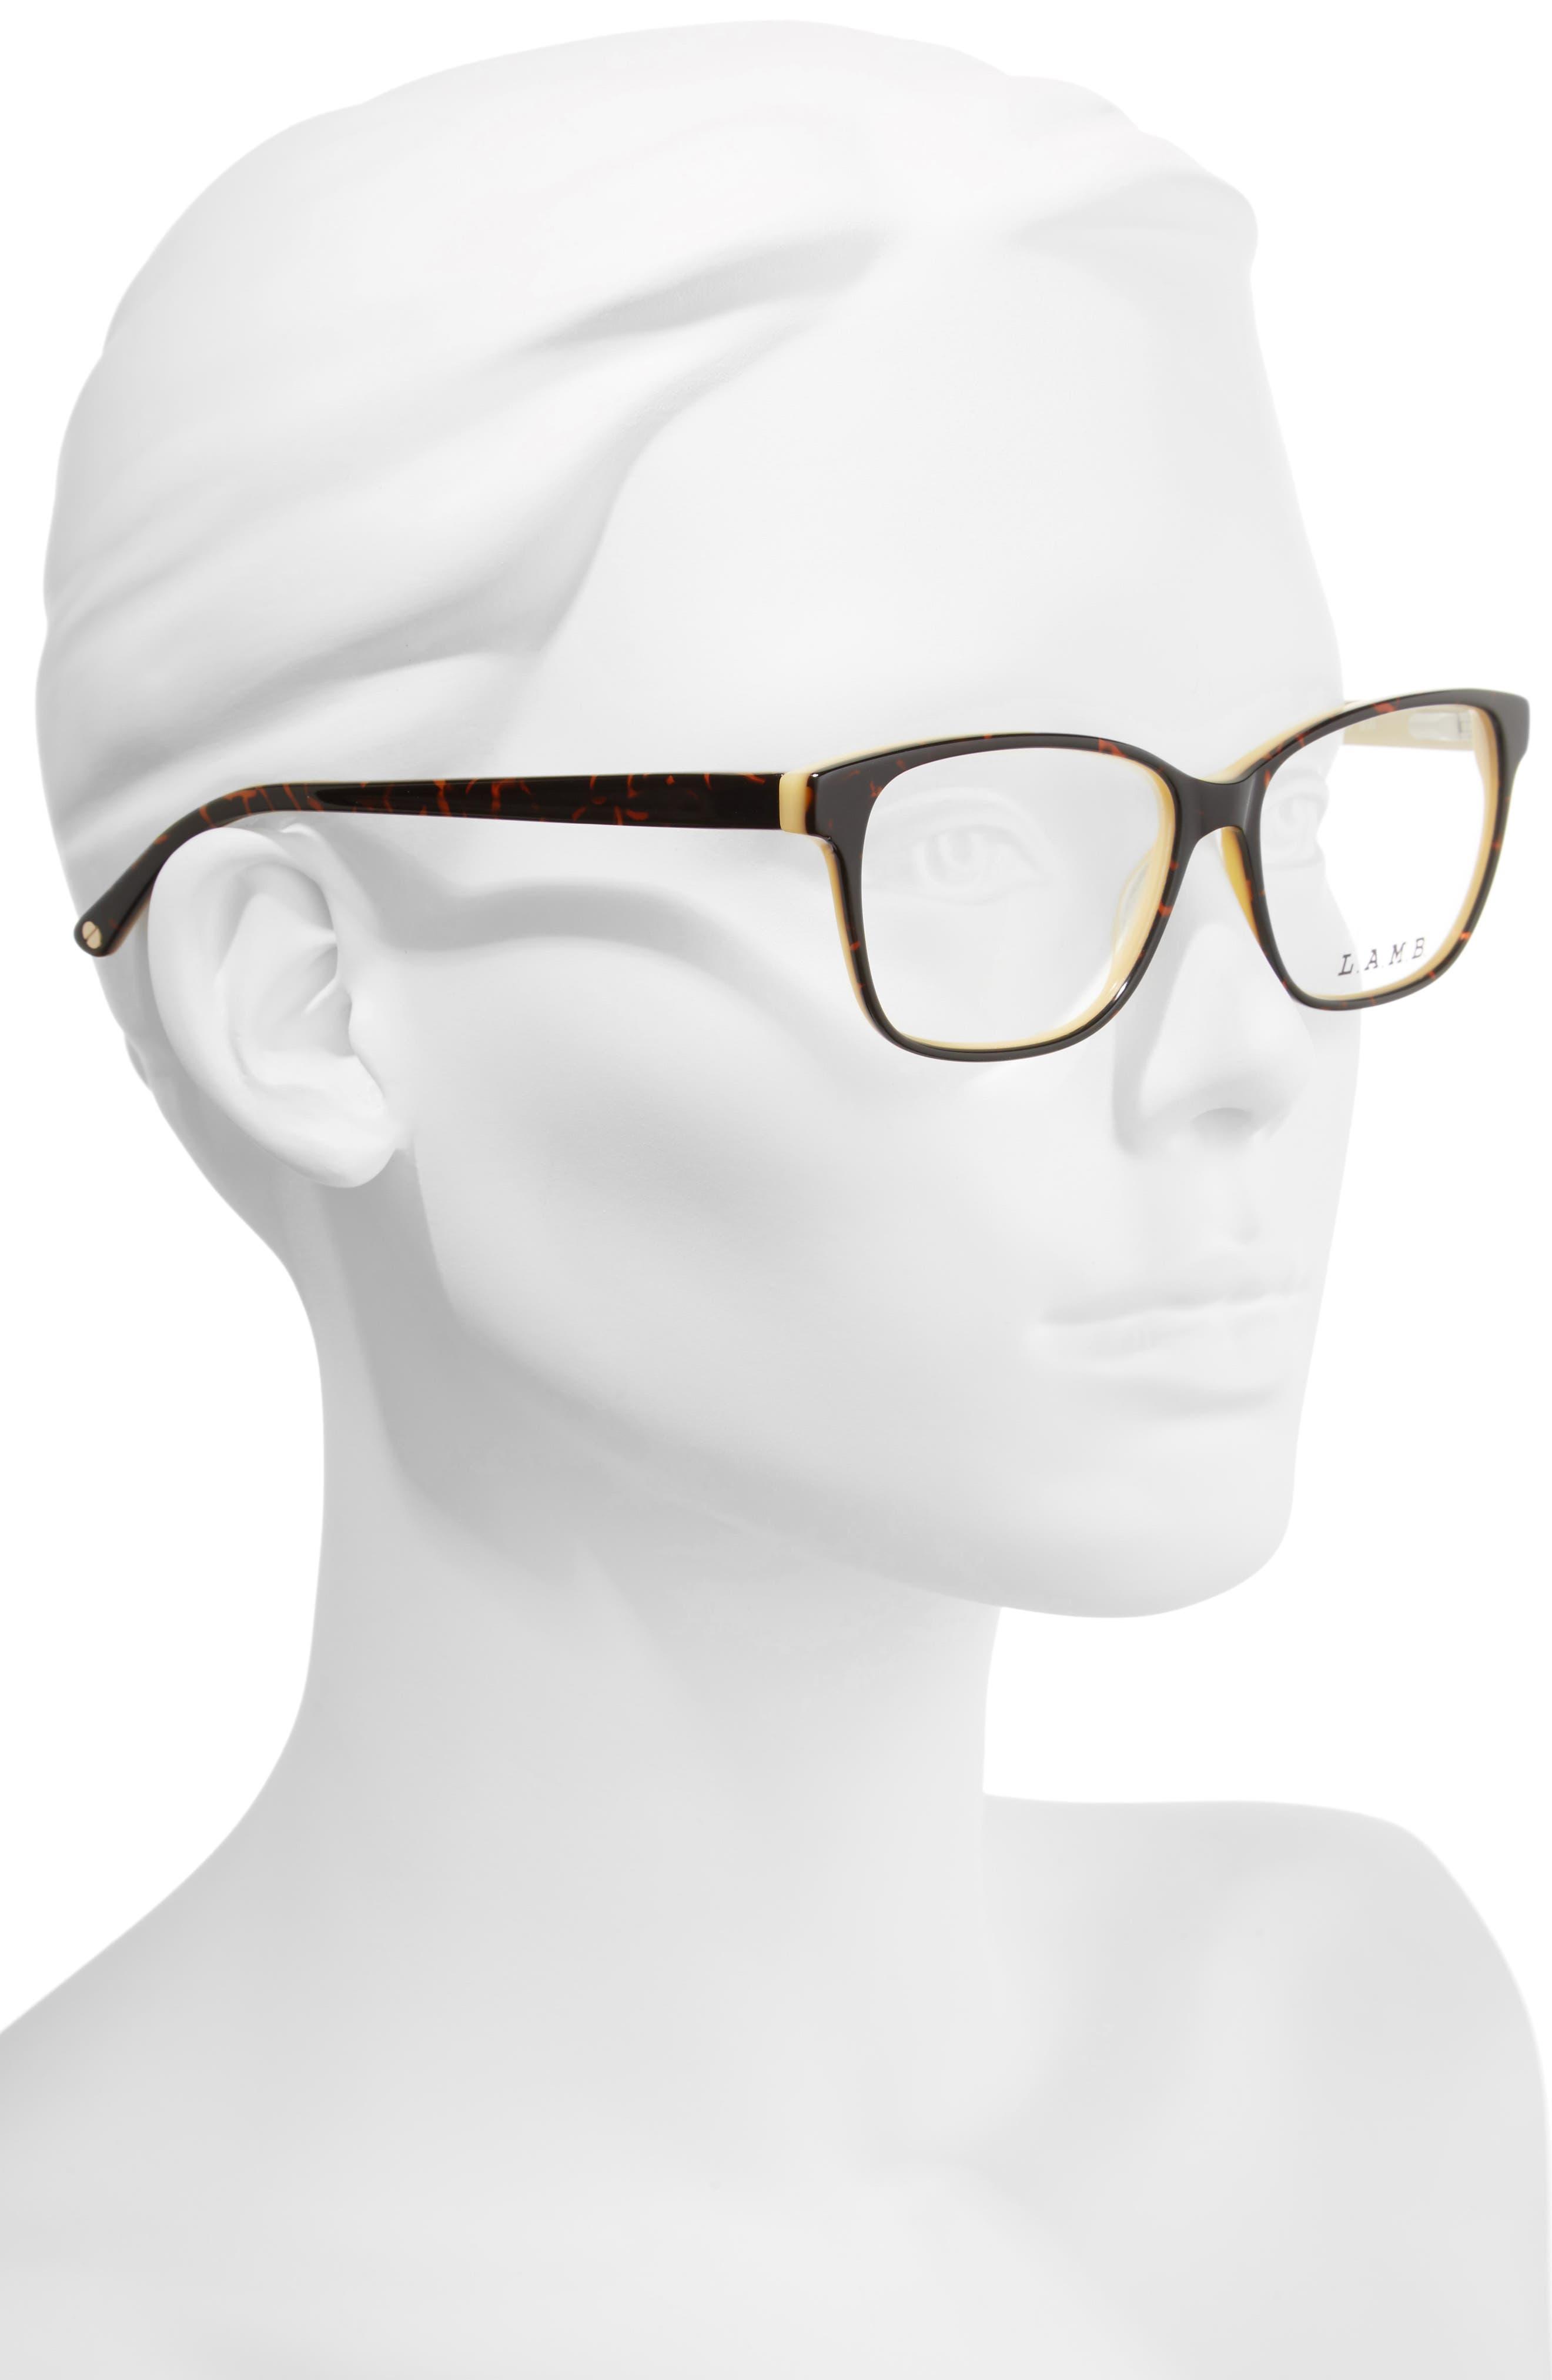 54mm Square Optical Glasses,                             Alternate thumbnail 2, color,                             Yellow